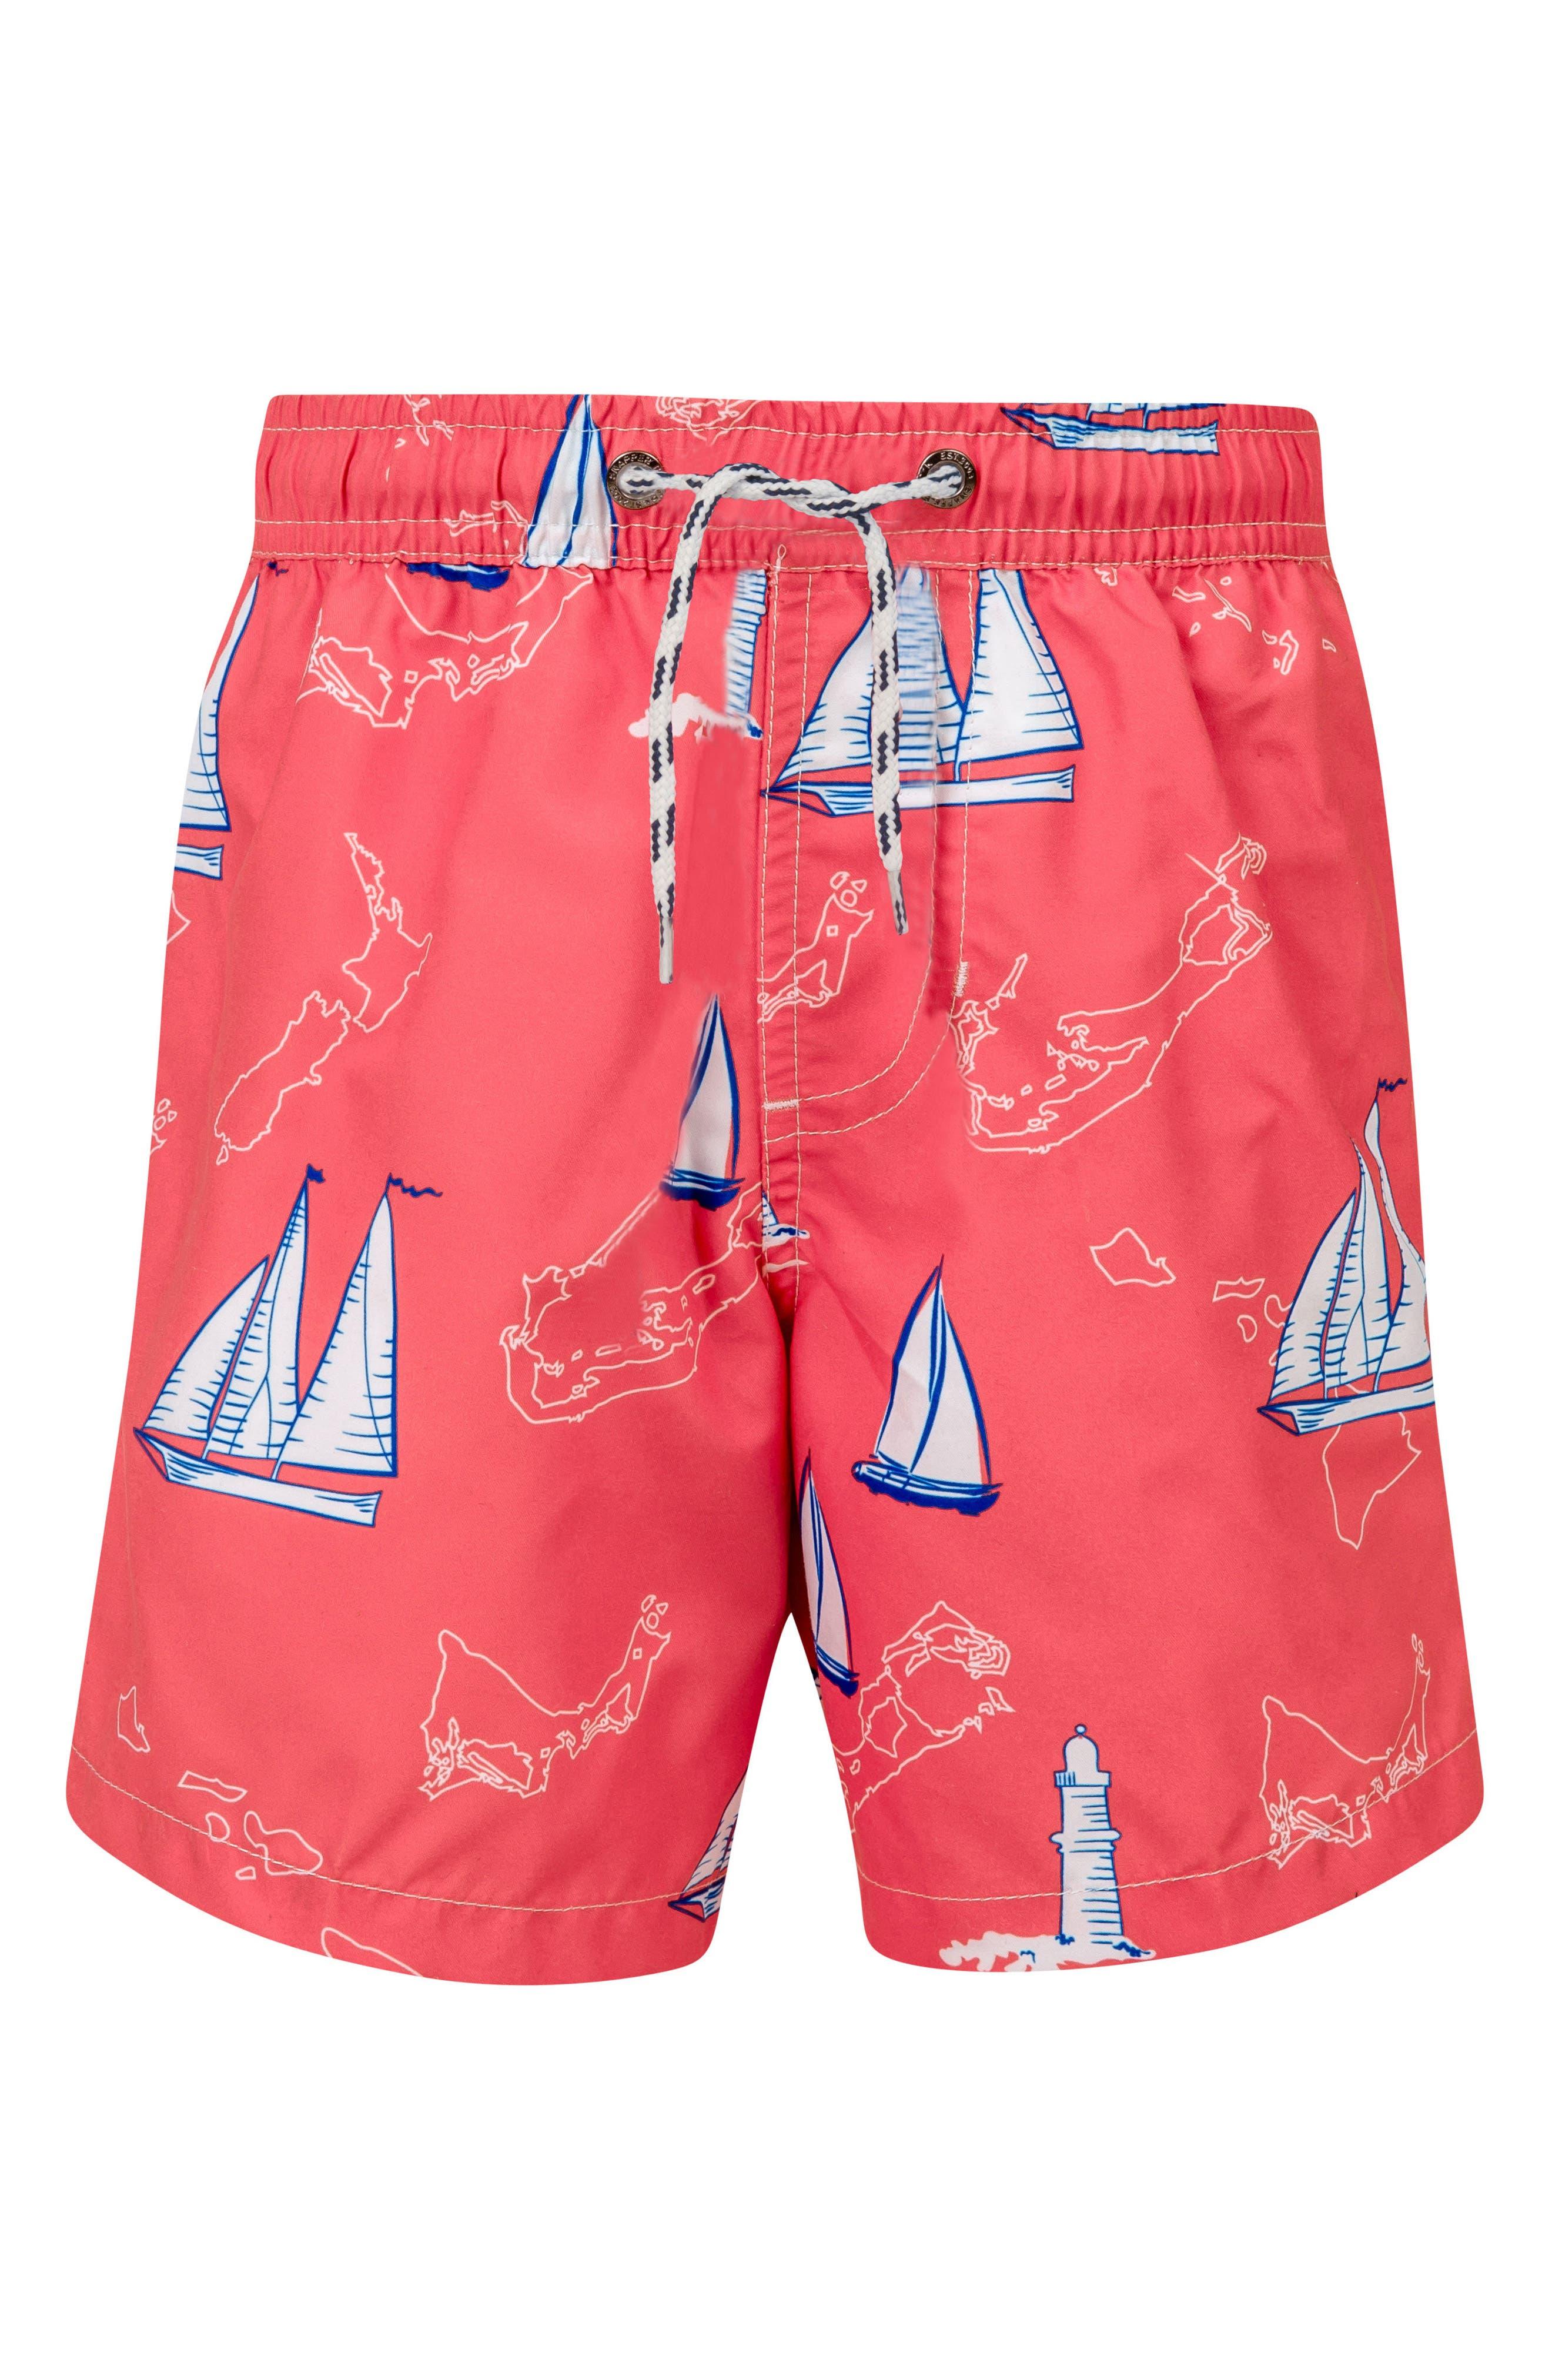 Island Sail Board Shorts,                         Main,                         color, 630